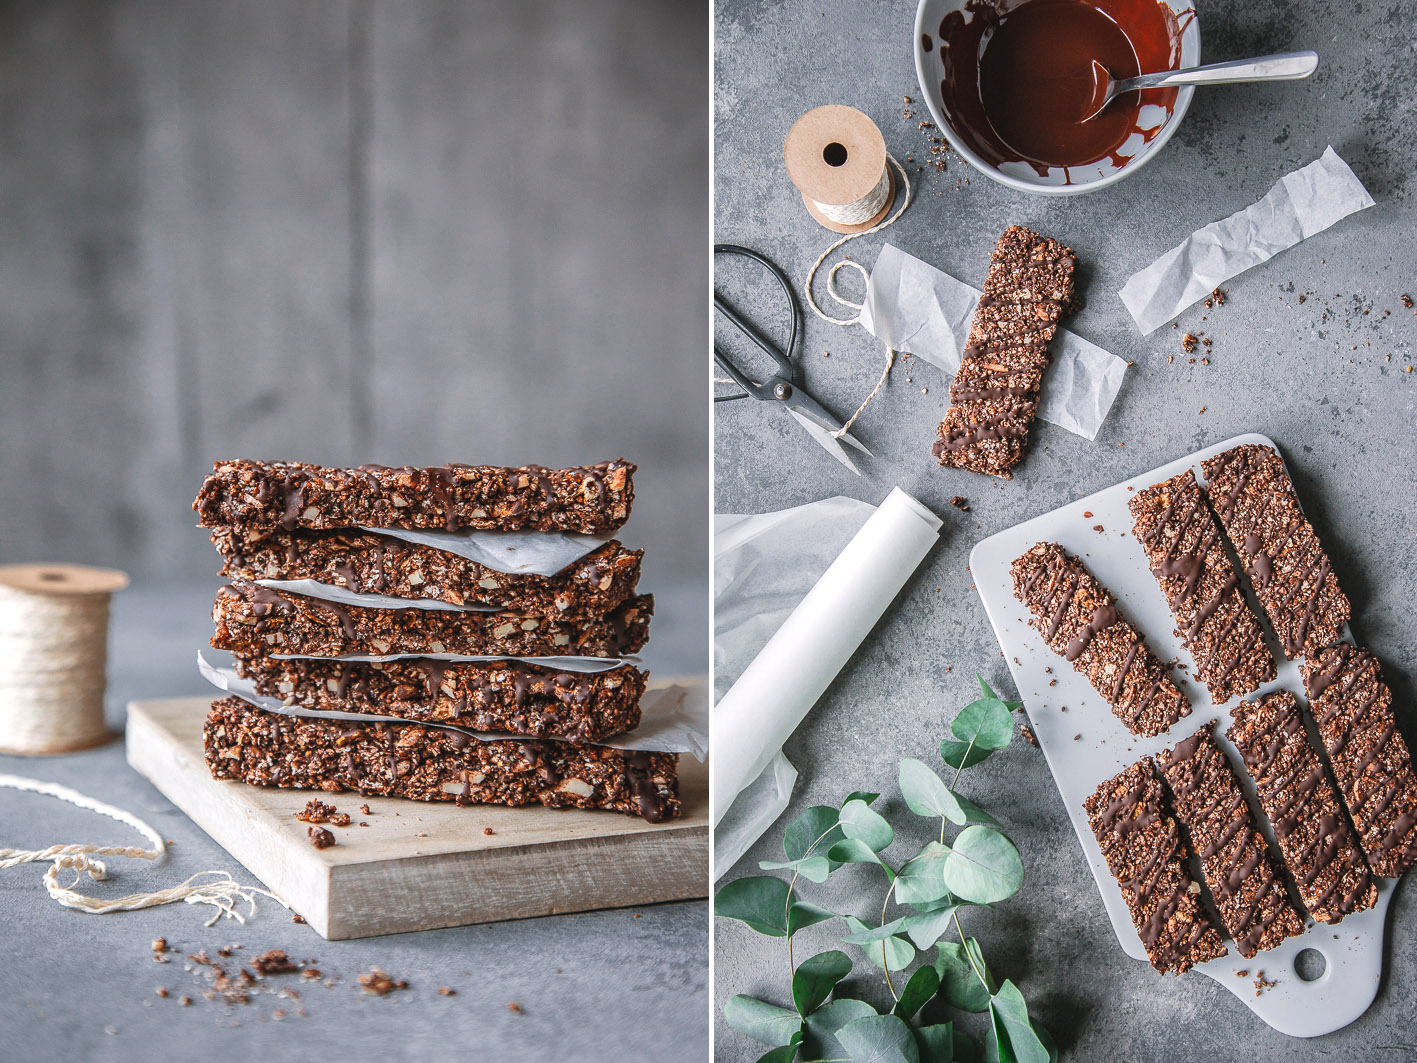 Schokoladen-Knusperriegel